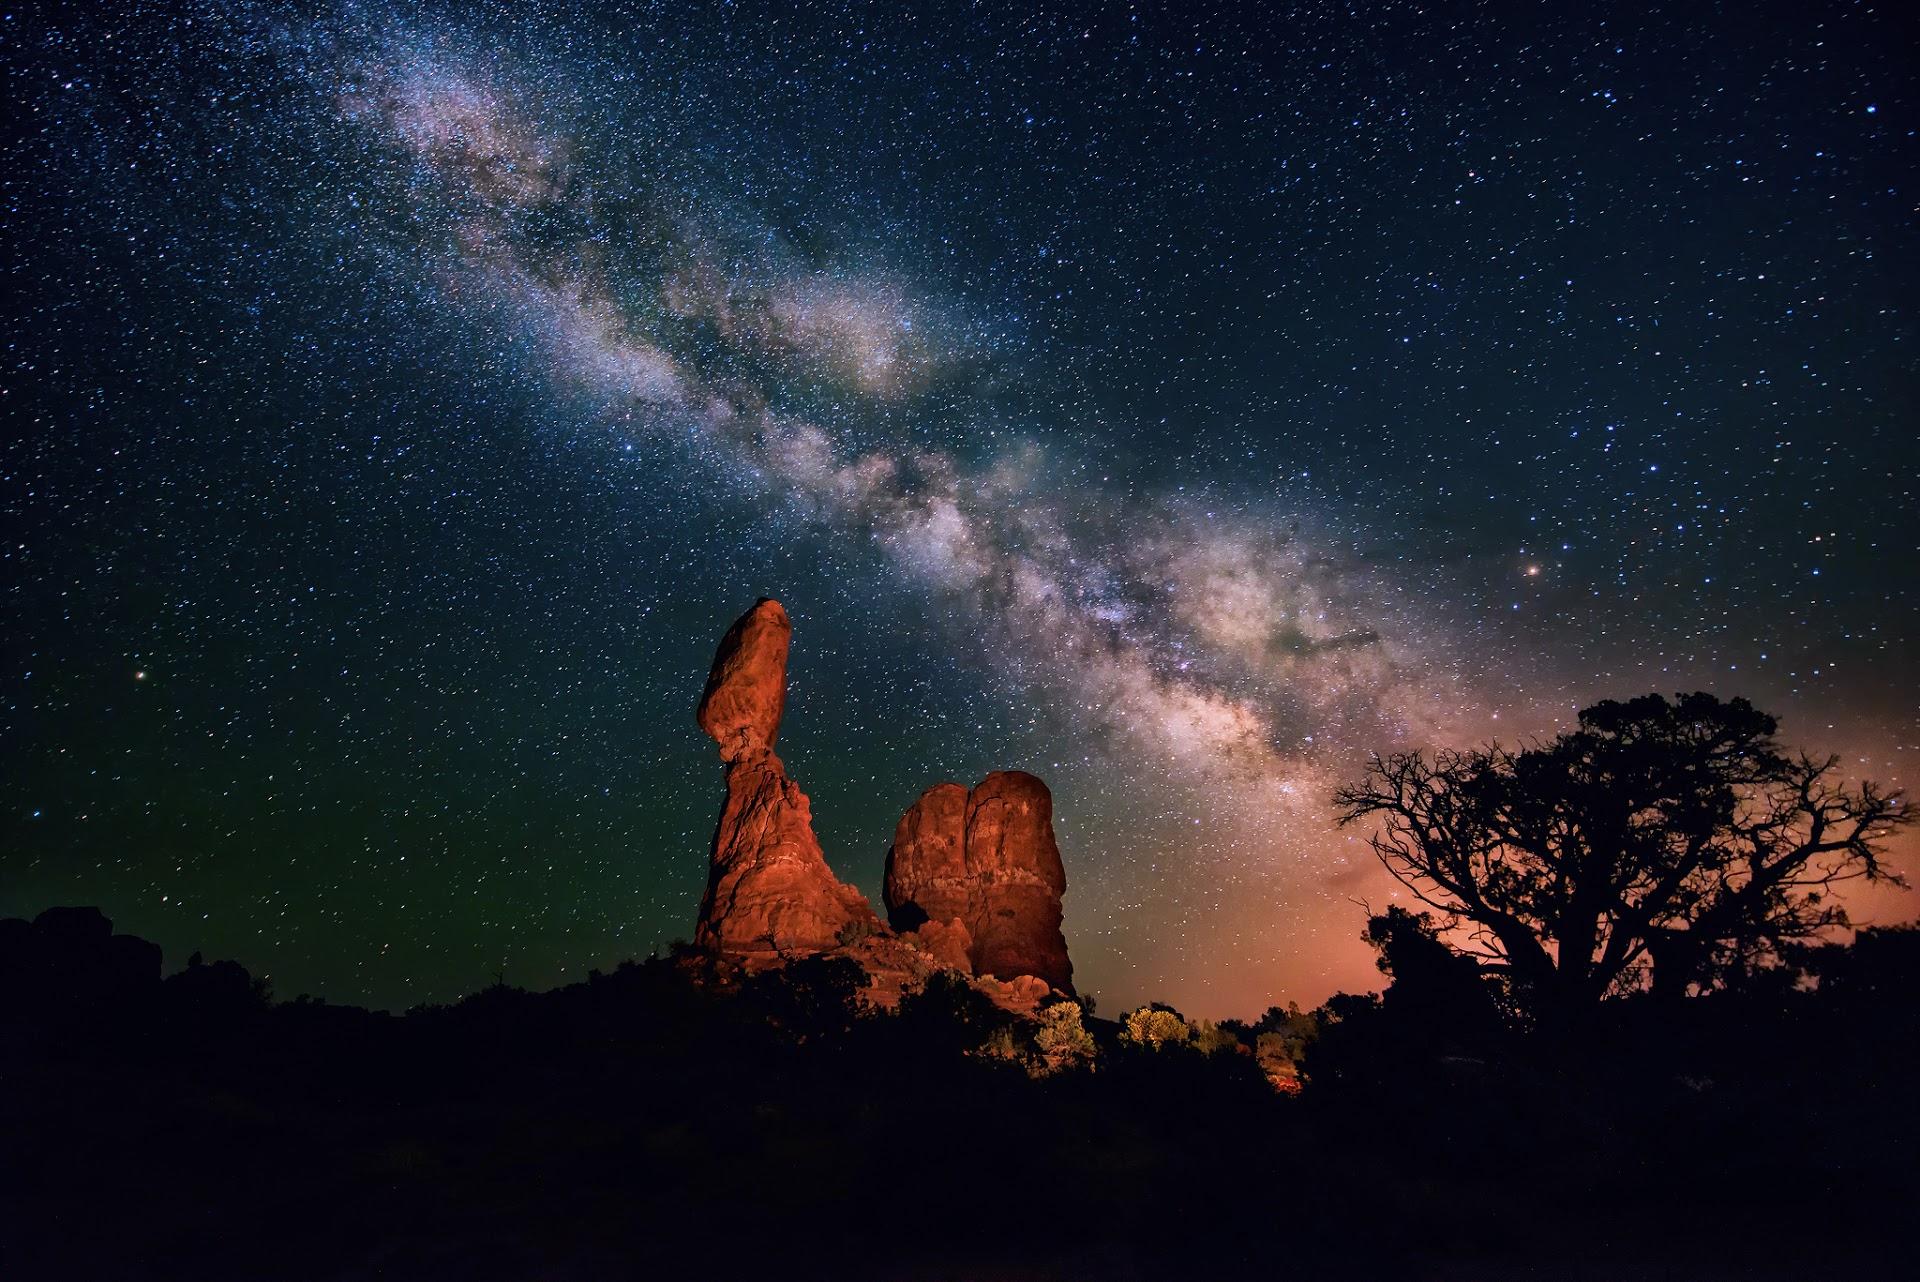 Cool Milky Way Galaxy Wallpaper HD 1901 Wallpaper with 1920x1282 1920x1282